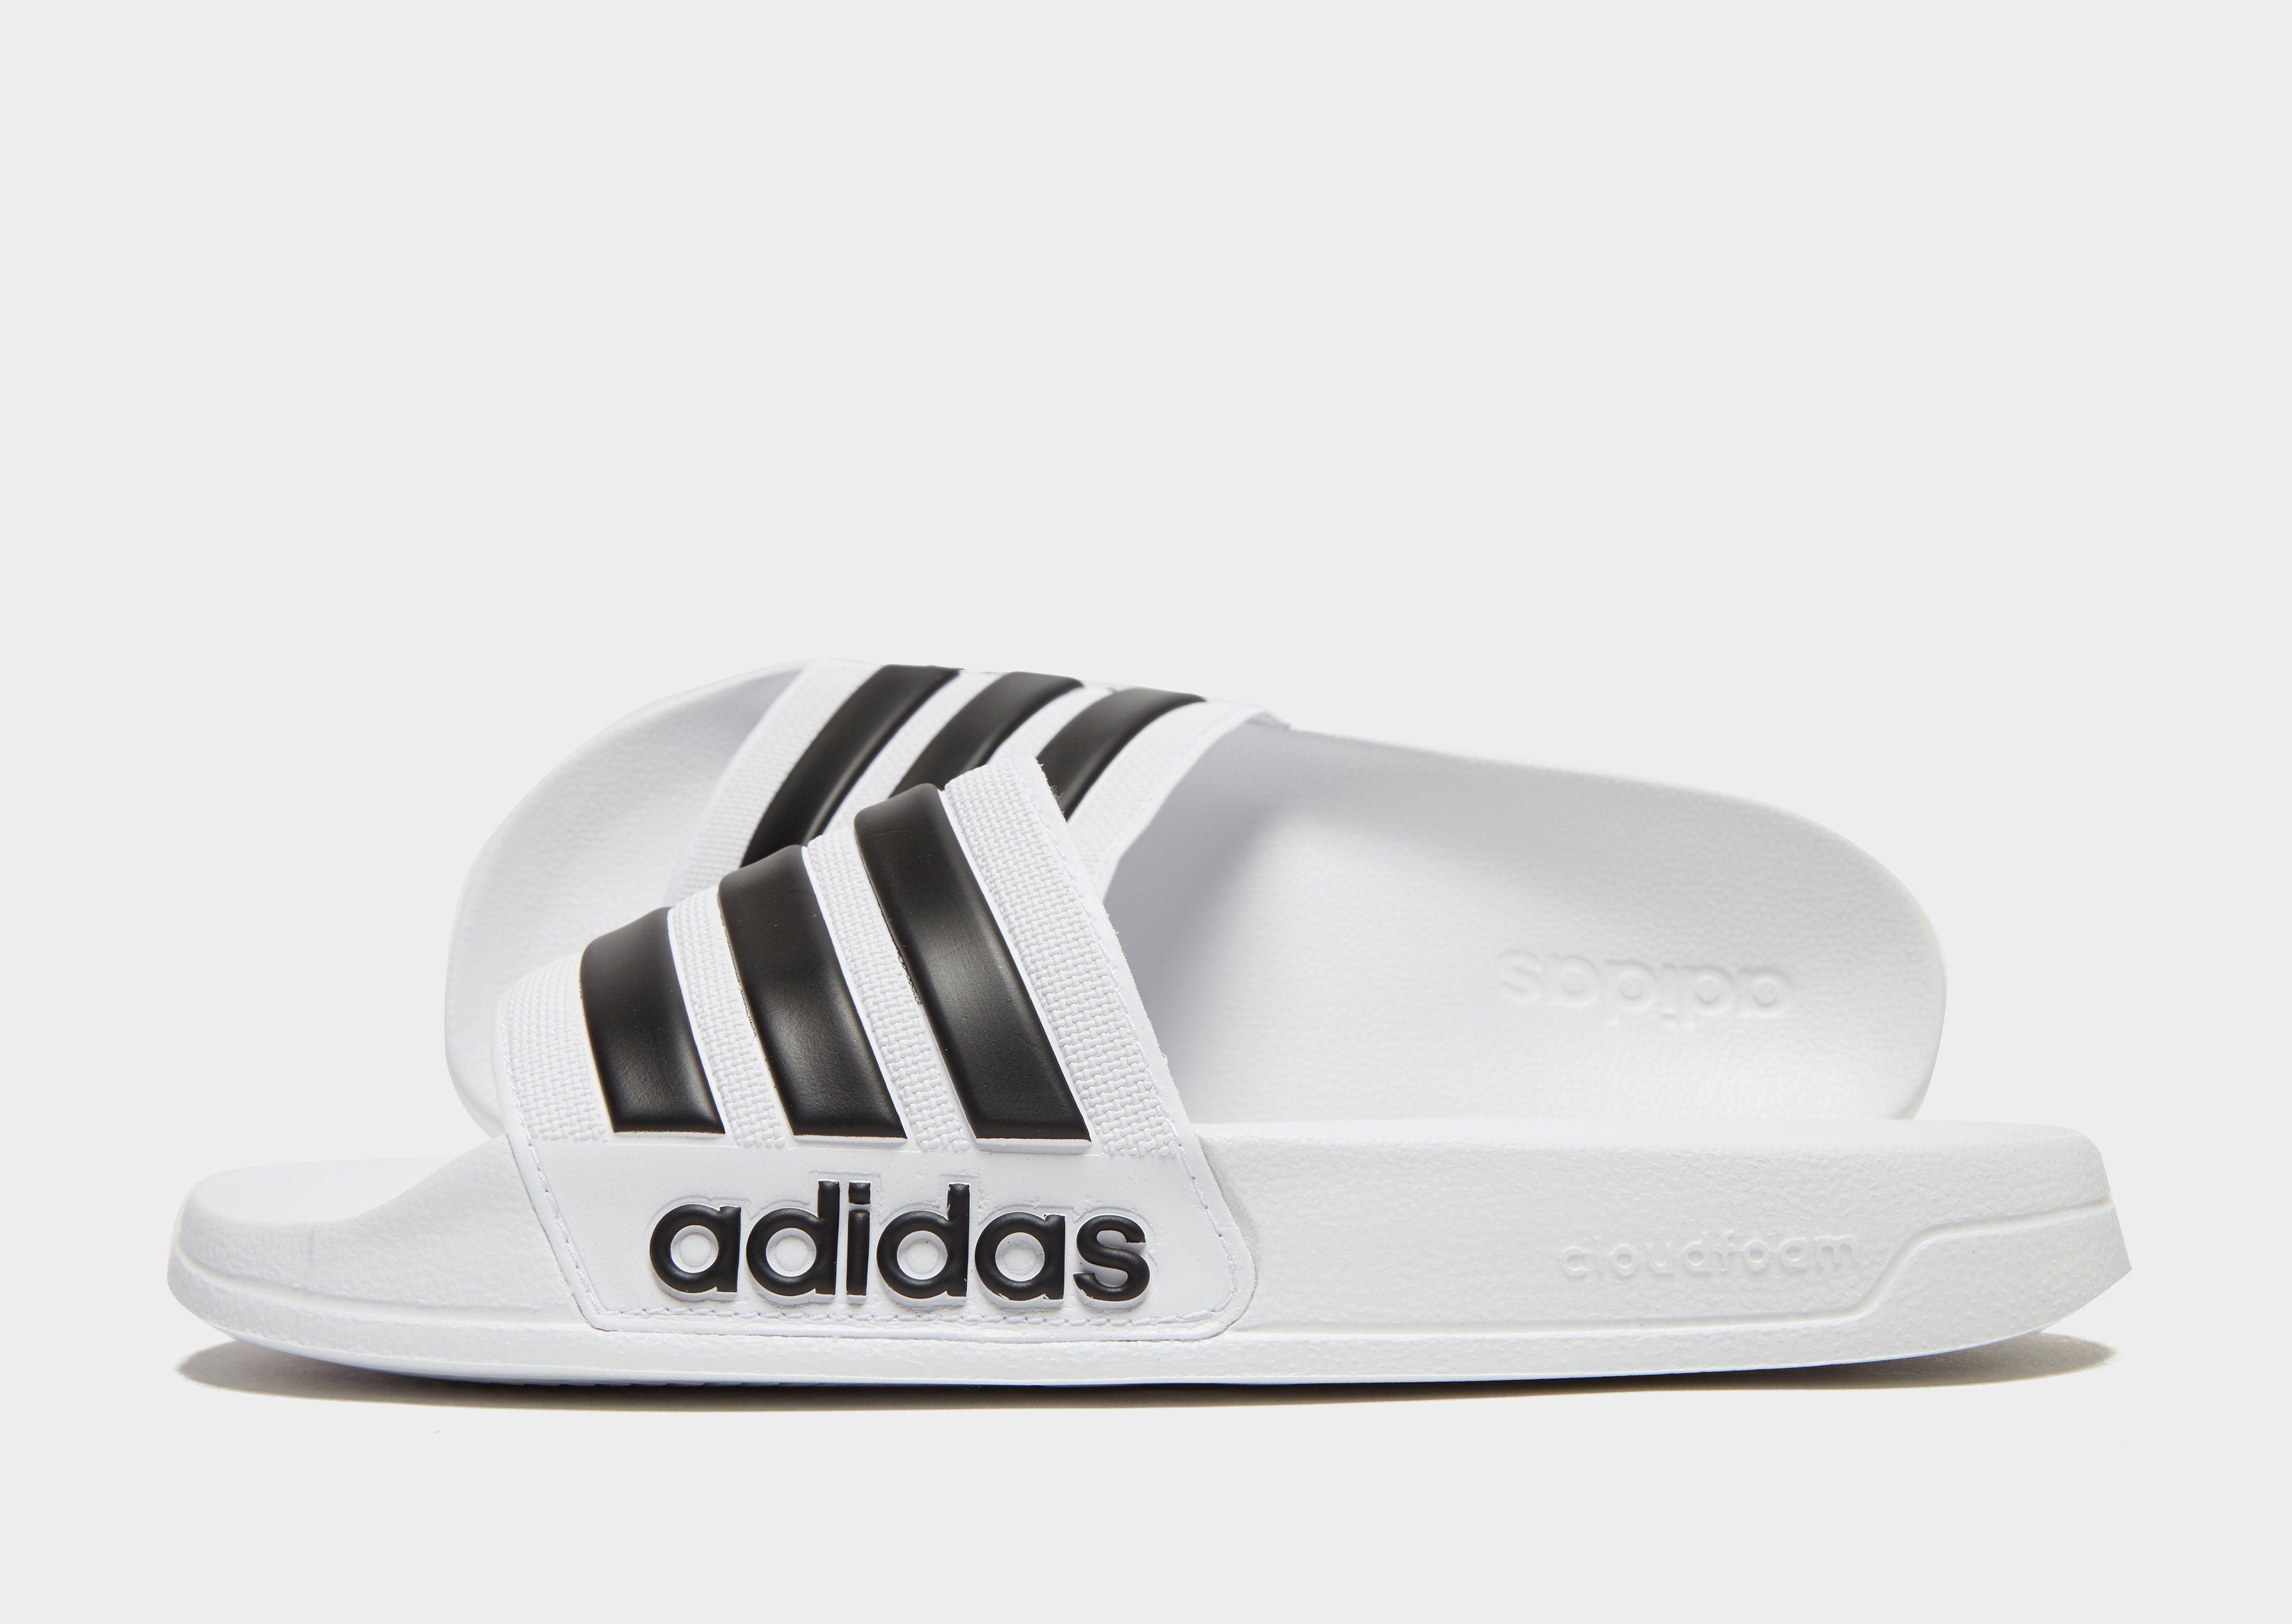 d7ad4b068393 adidas Cloudfoam Adilette Slides